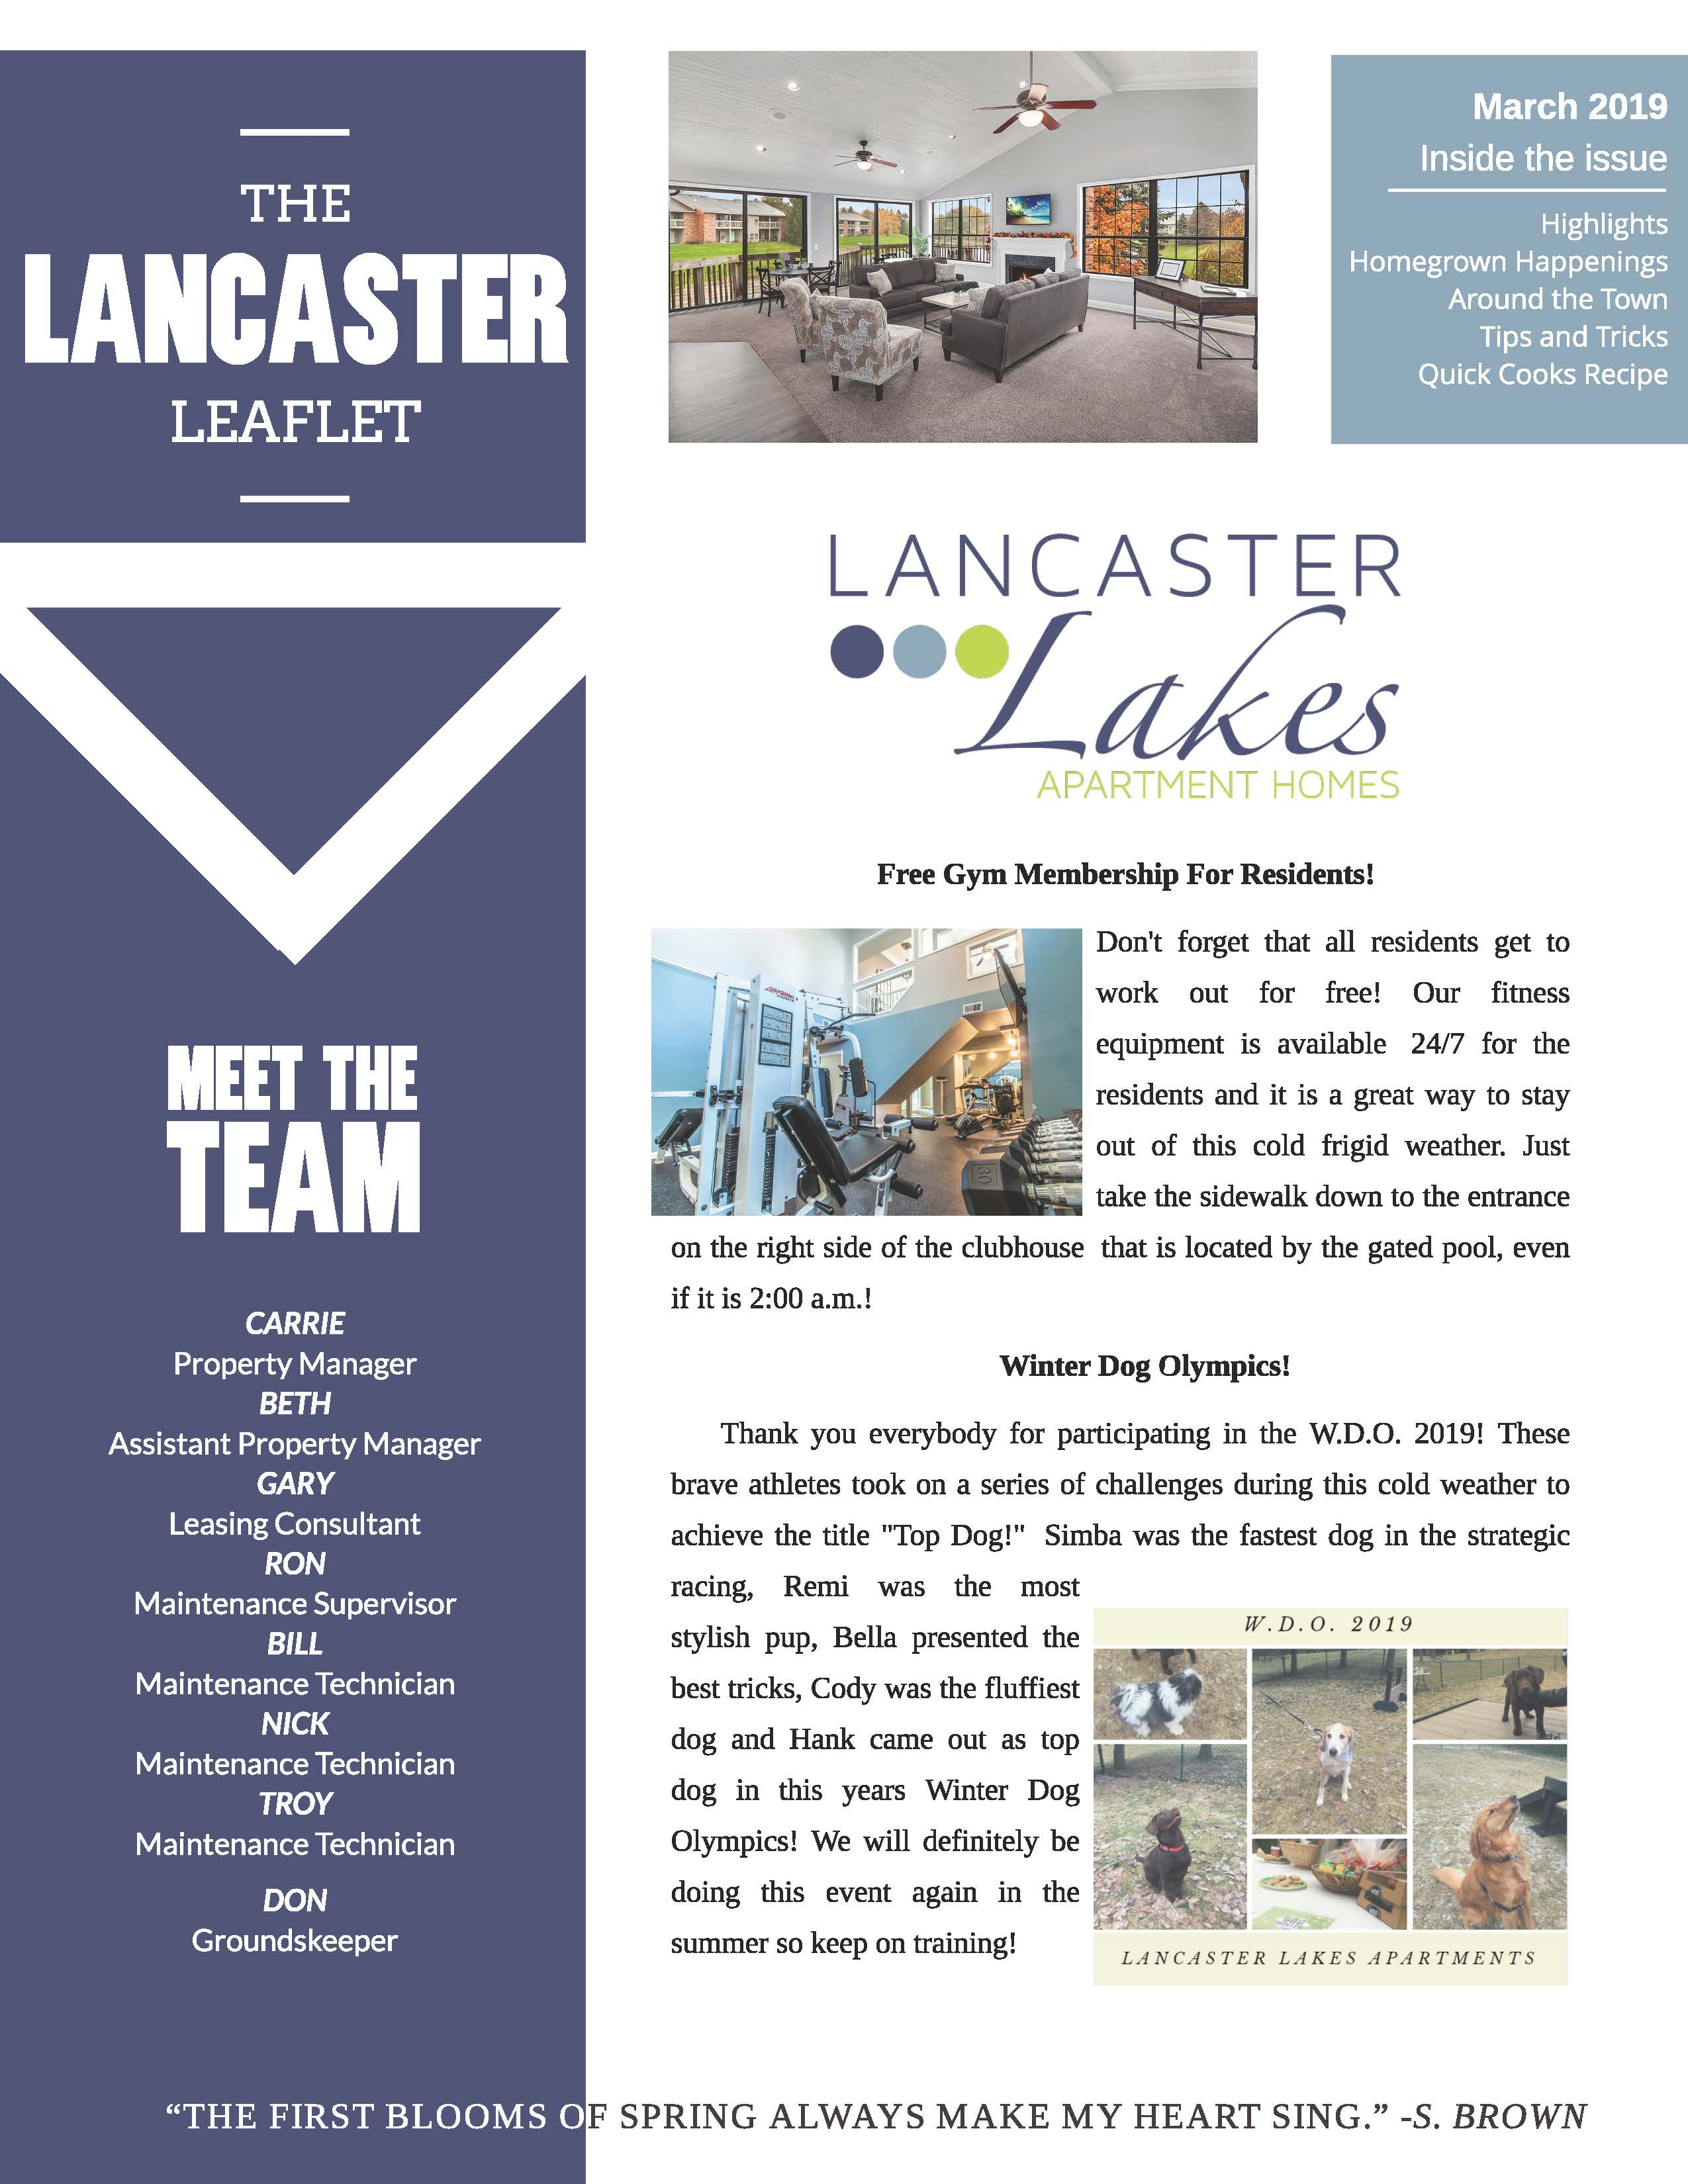 The Lancaster Lakes Community